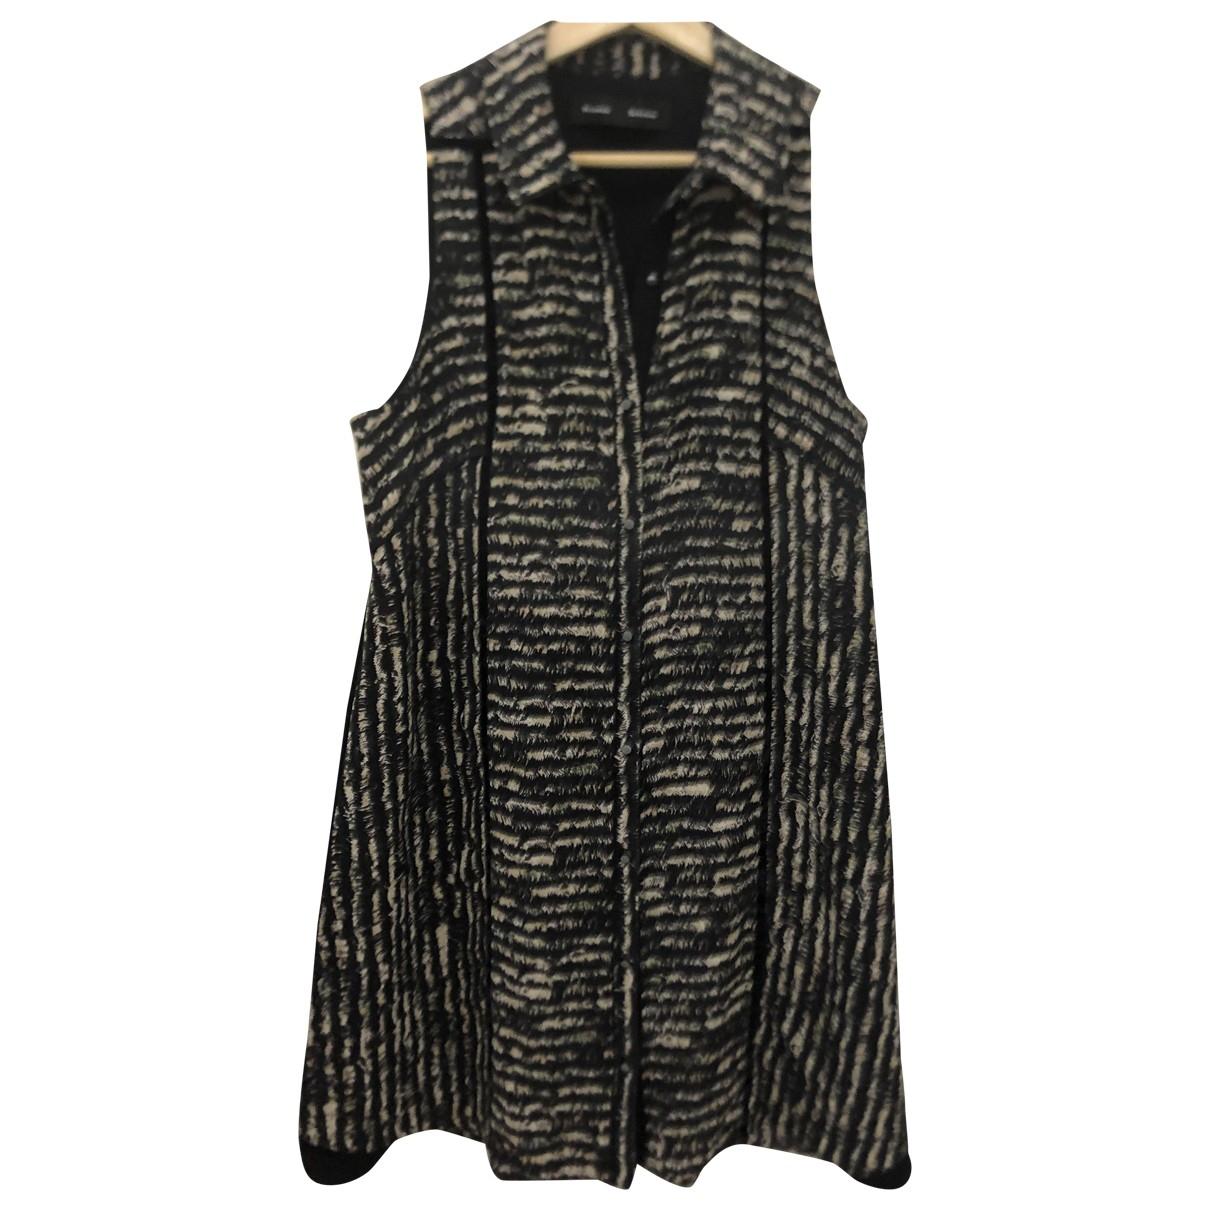 Proenza Schouler \N Black Silk dress for Women S International